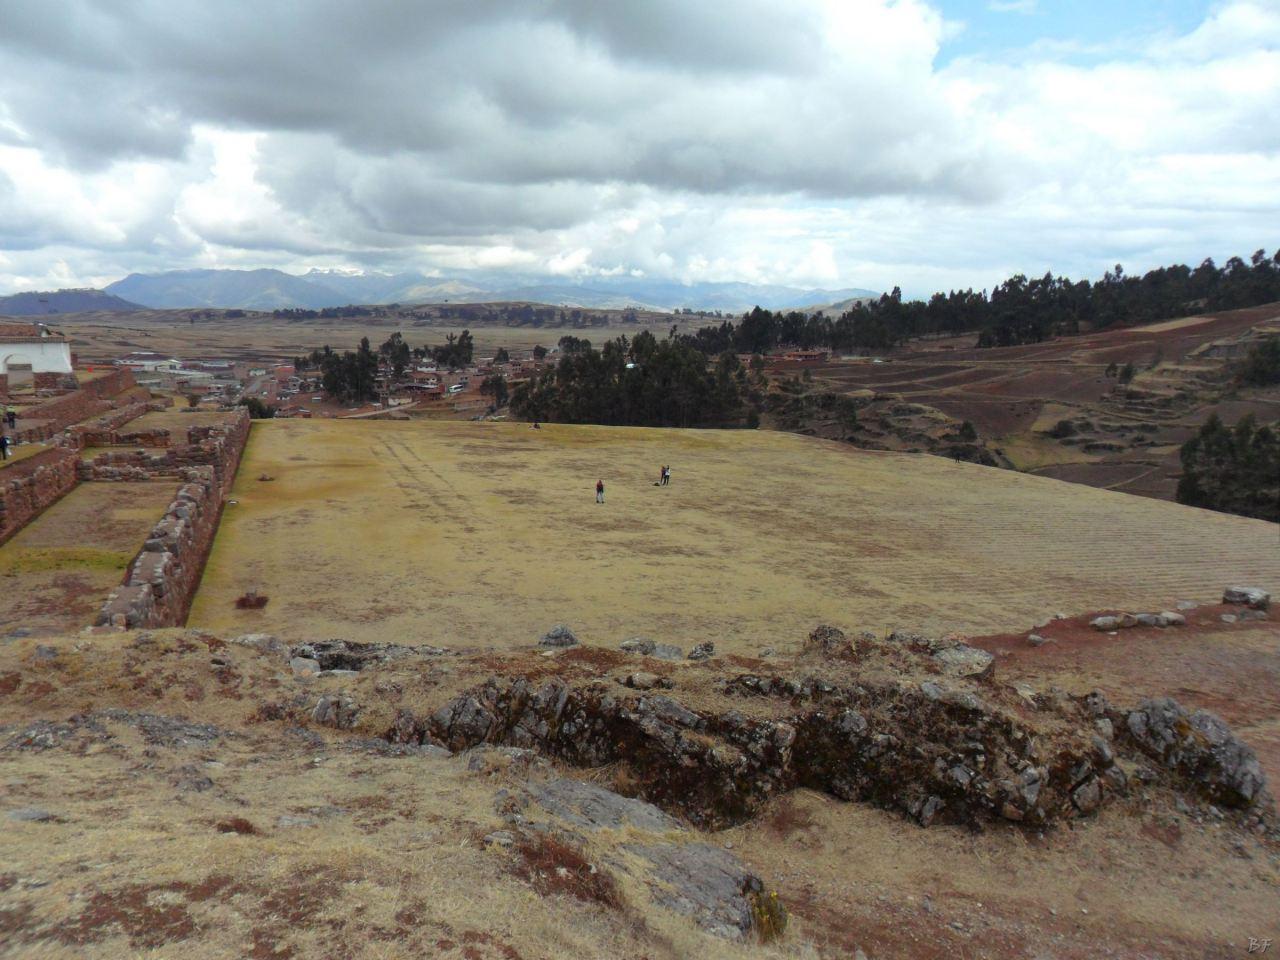 Chinchero-Mura-Poligonali-Piramide-Urubamba-Peru-45